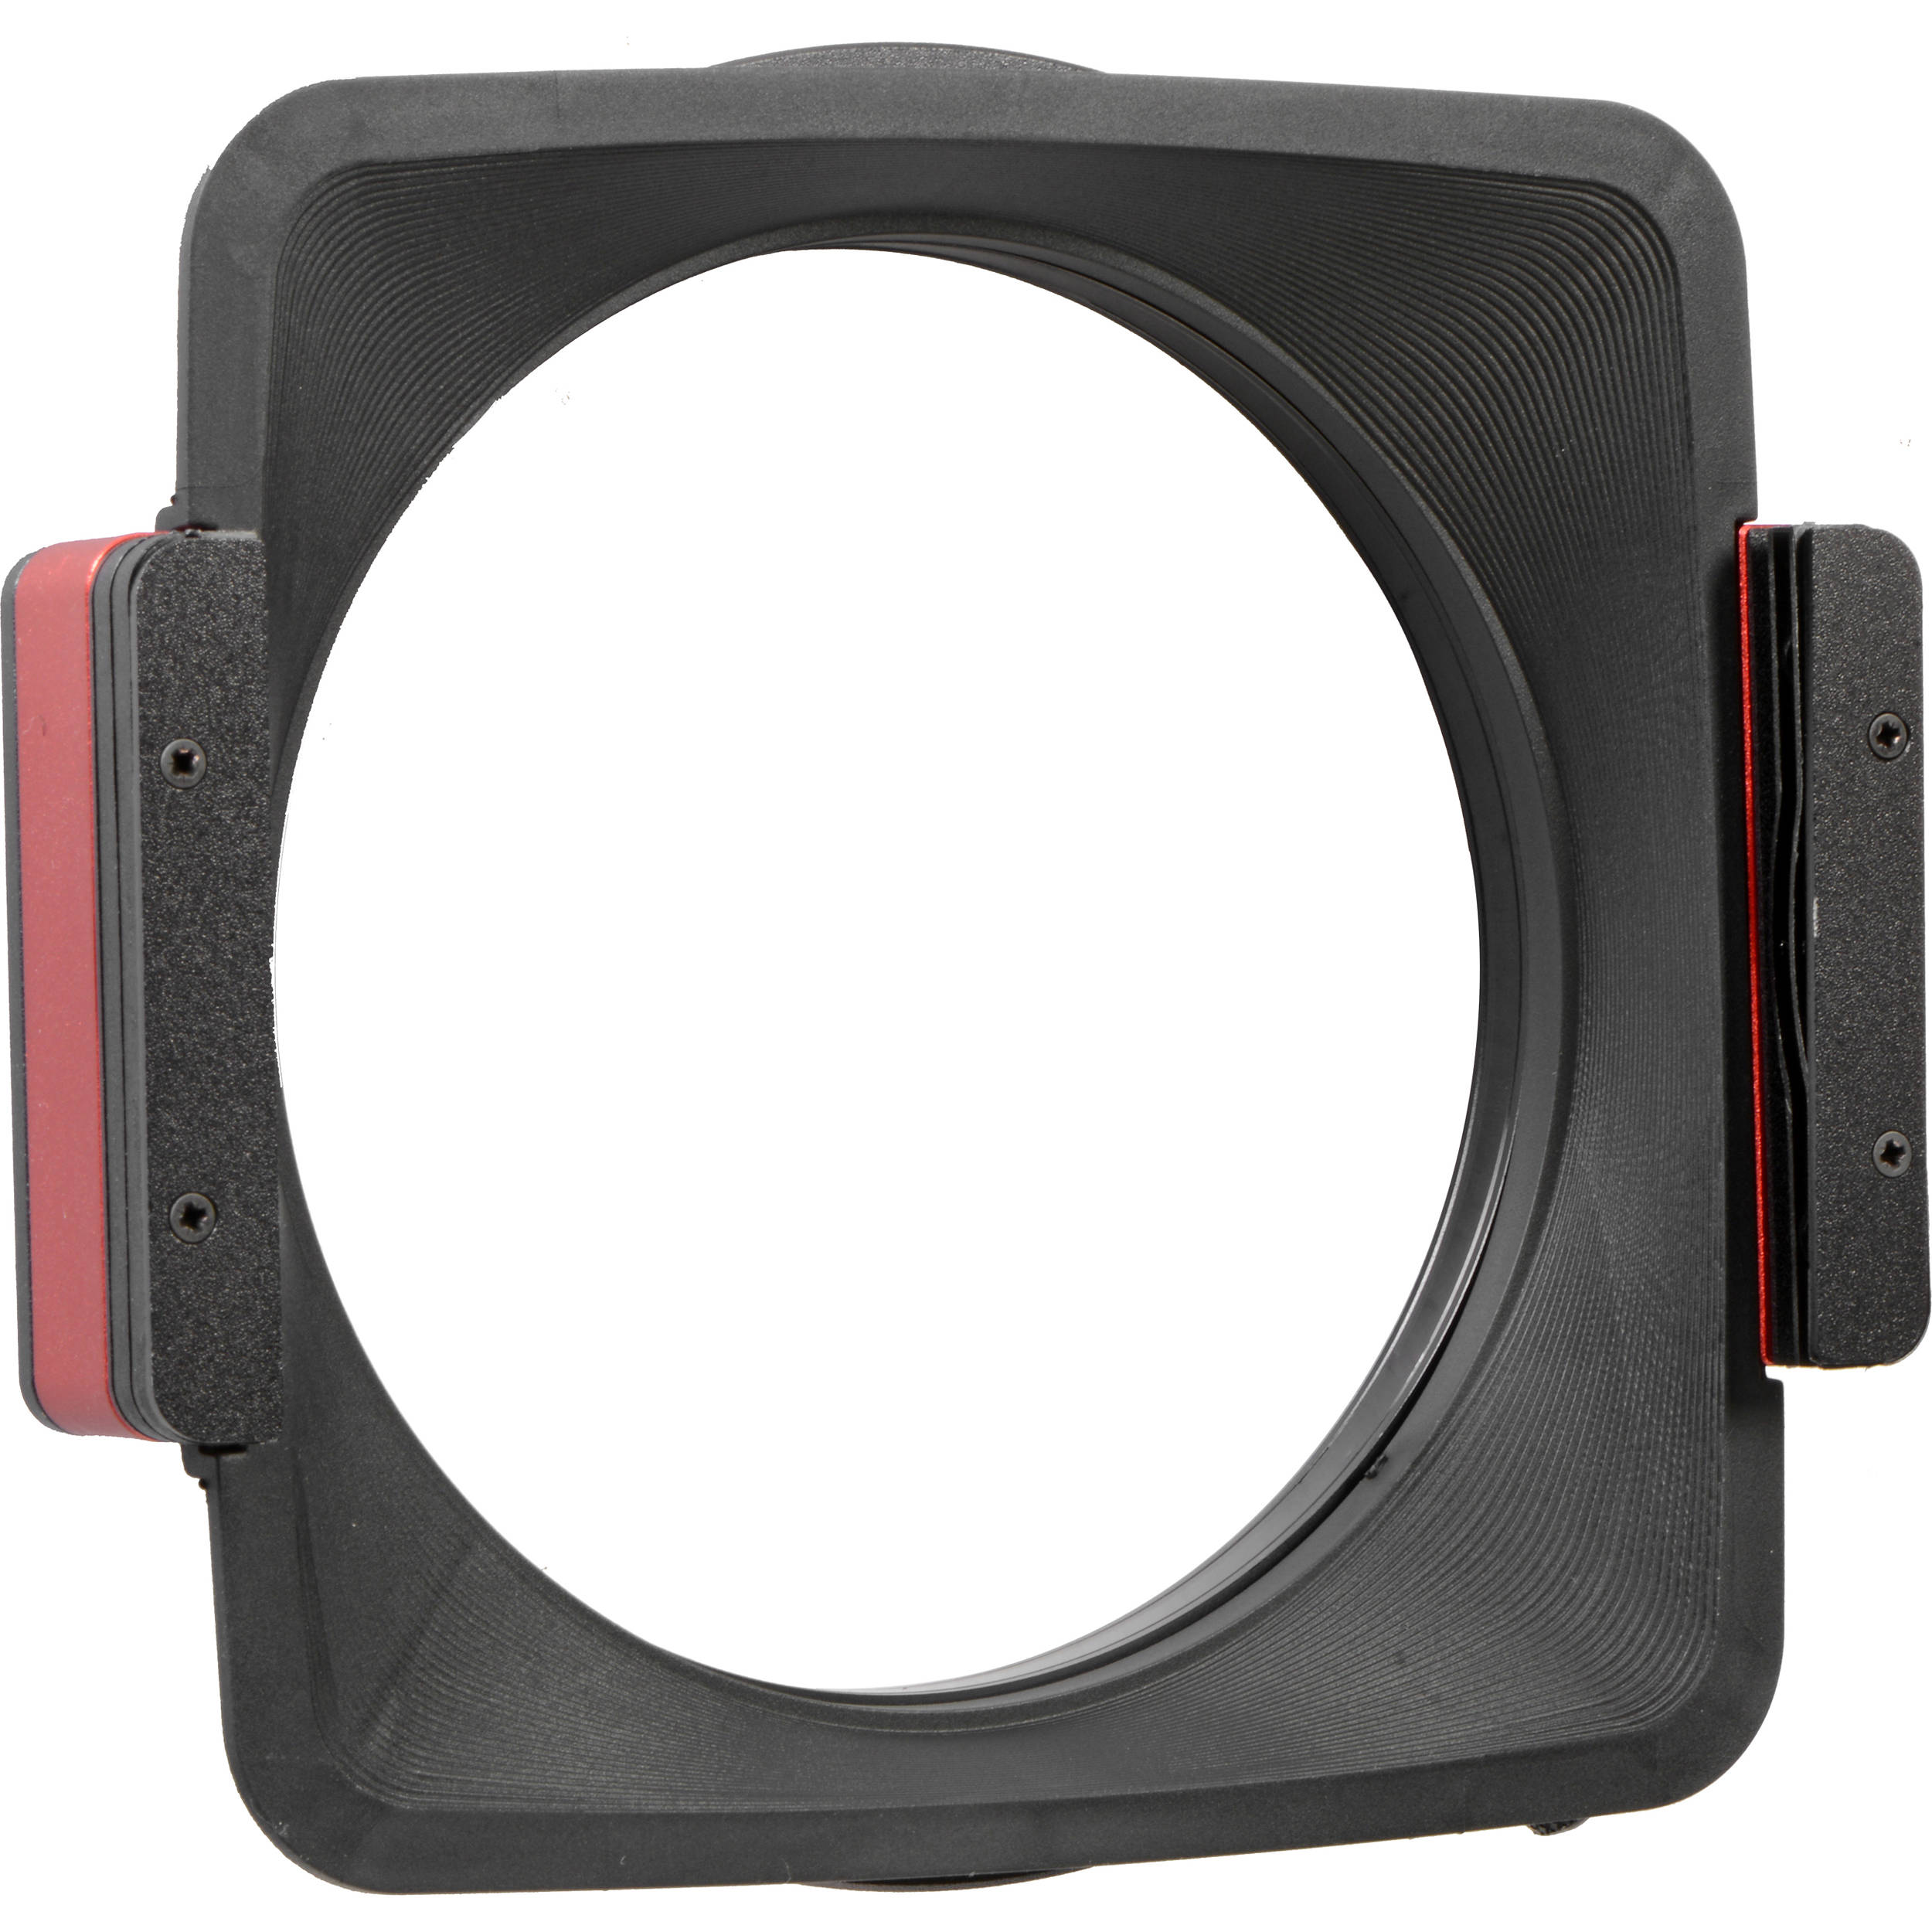 Filter Holders & Frames | B&H Photo Video